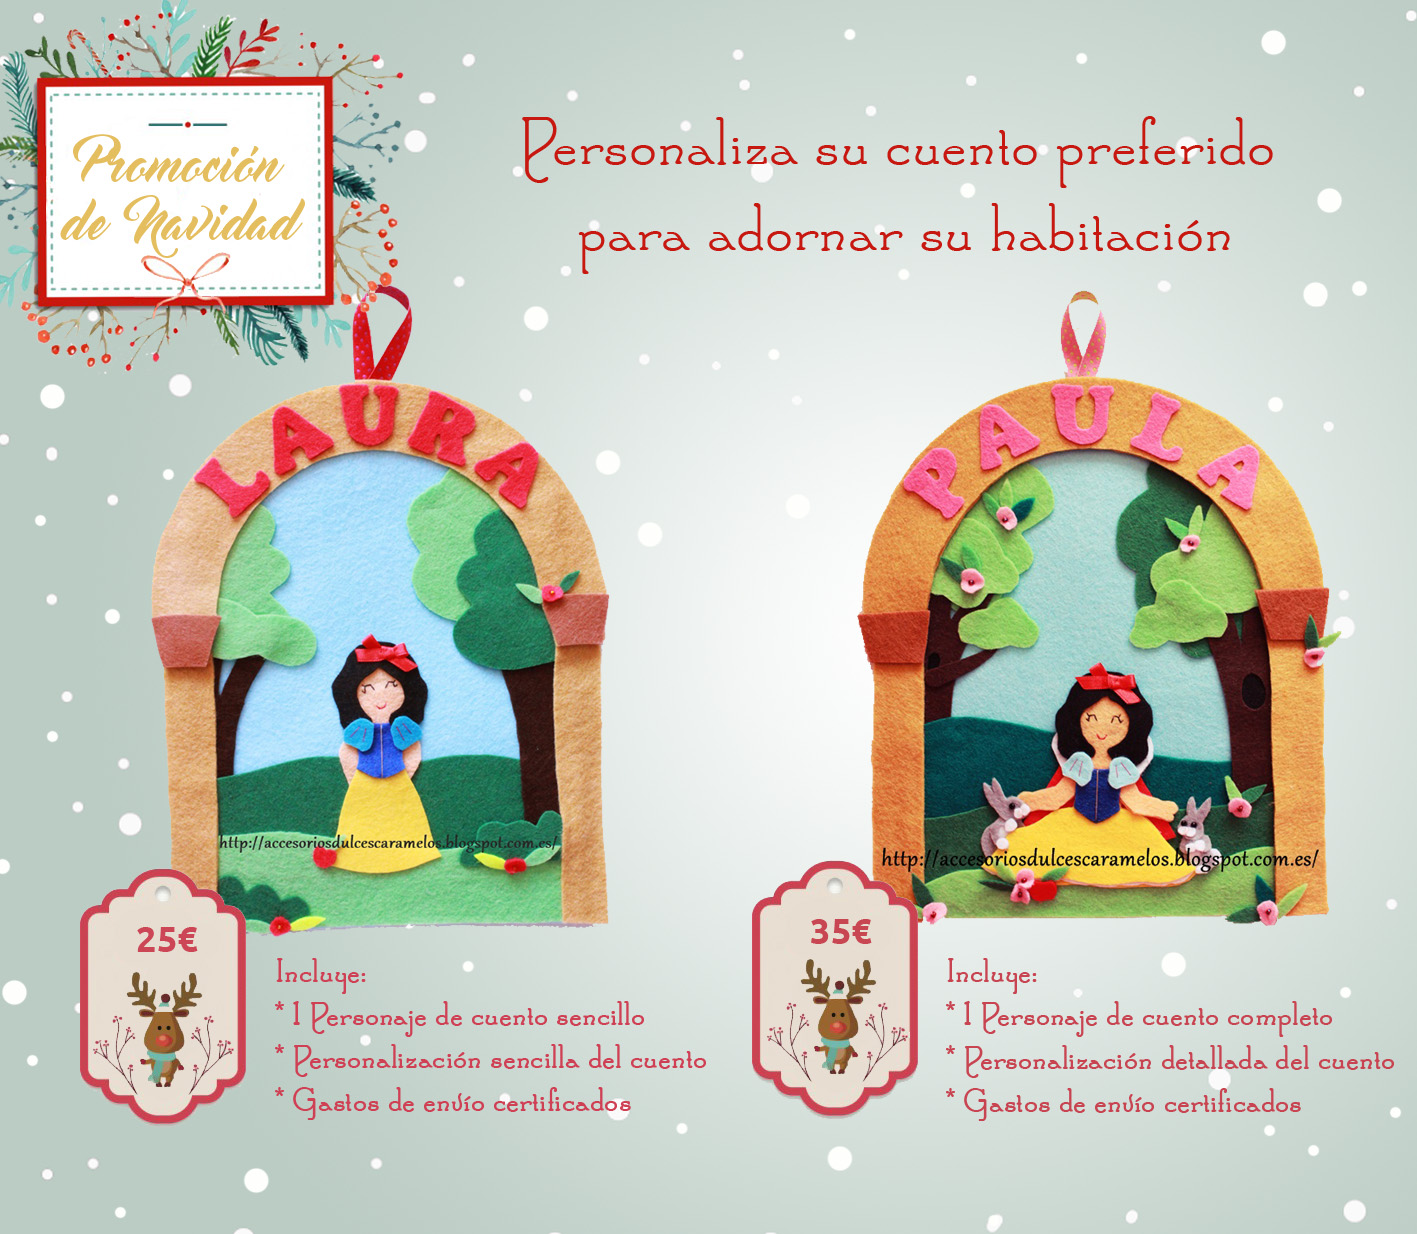 ¿Buscando ideas de regalos navideños?